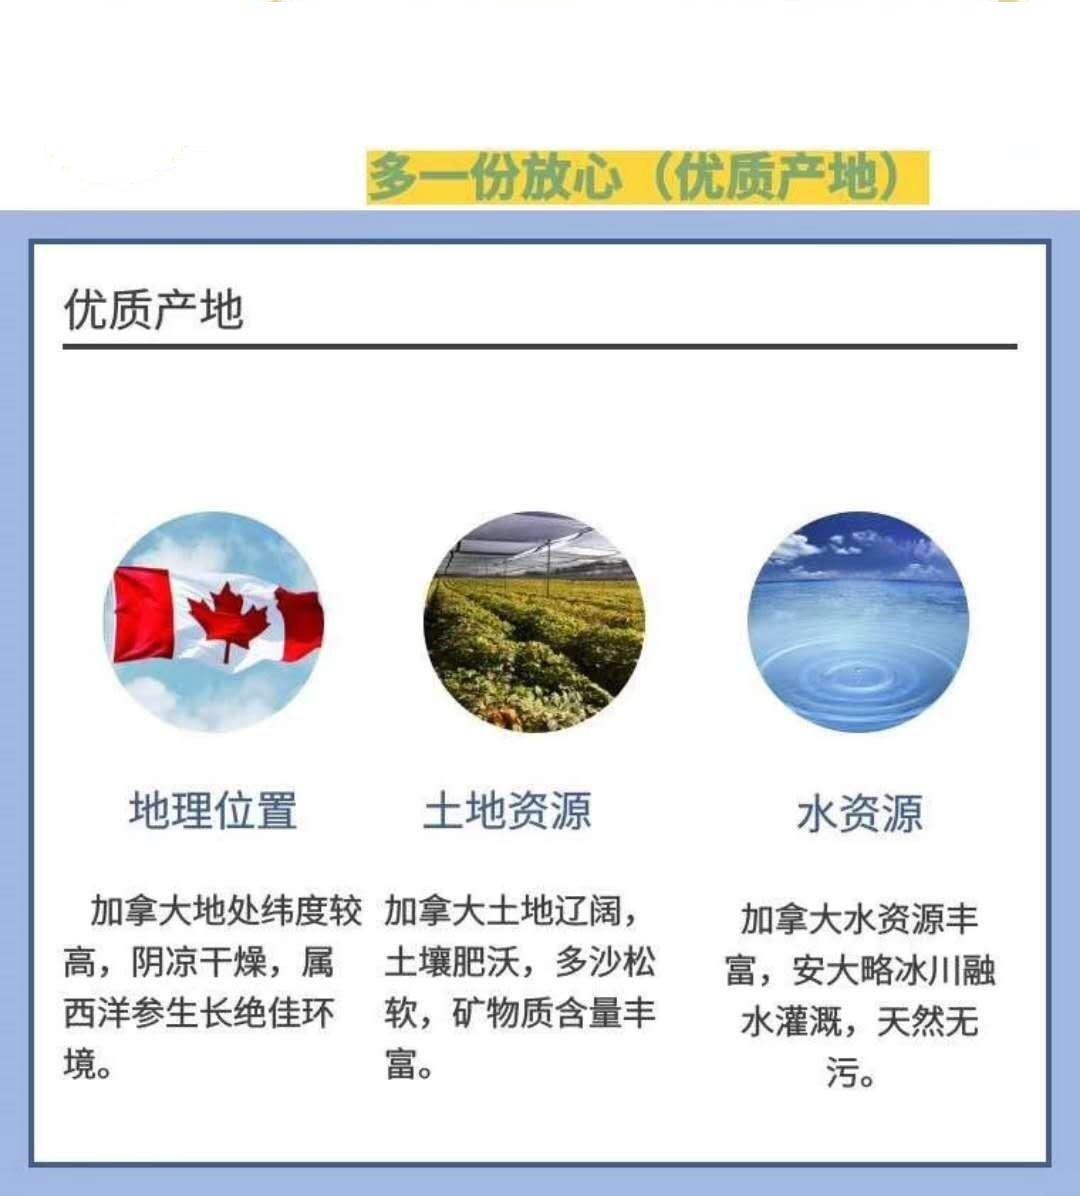 Product_奇妙_Wild Mountain野山牌加拿大安大略西洋参】圆粒 每颗10g左右 227g:盒 A-3_